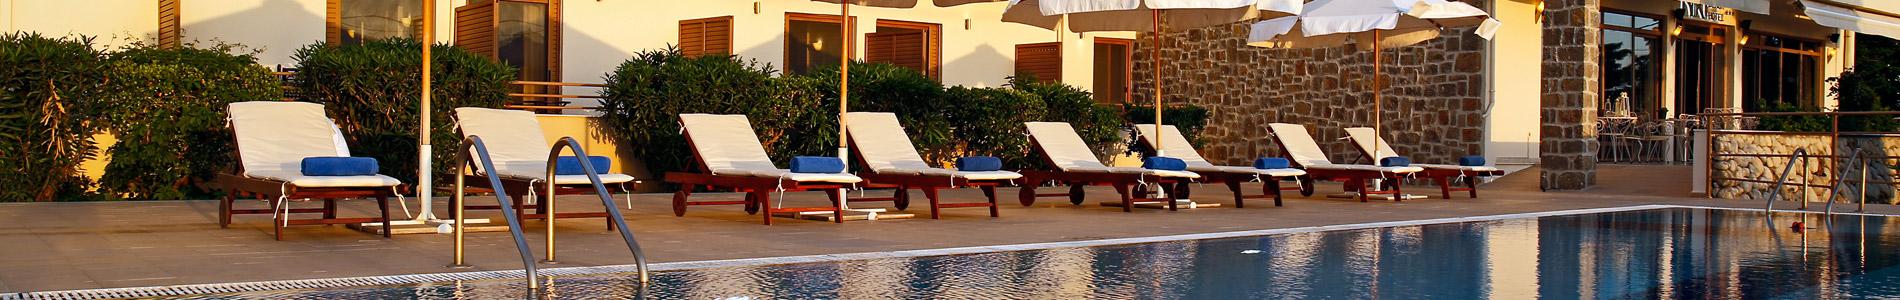 Niki Beach Hotel